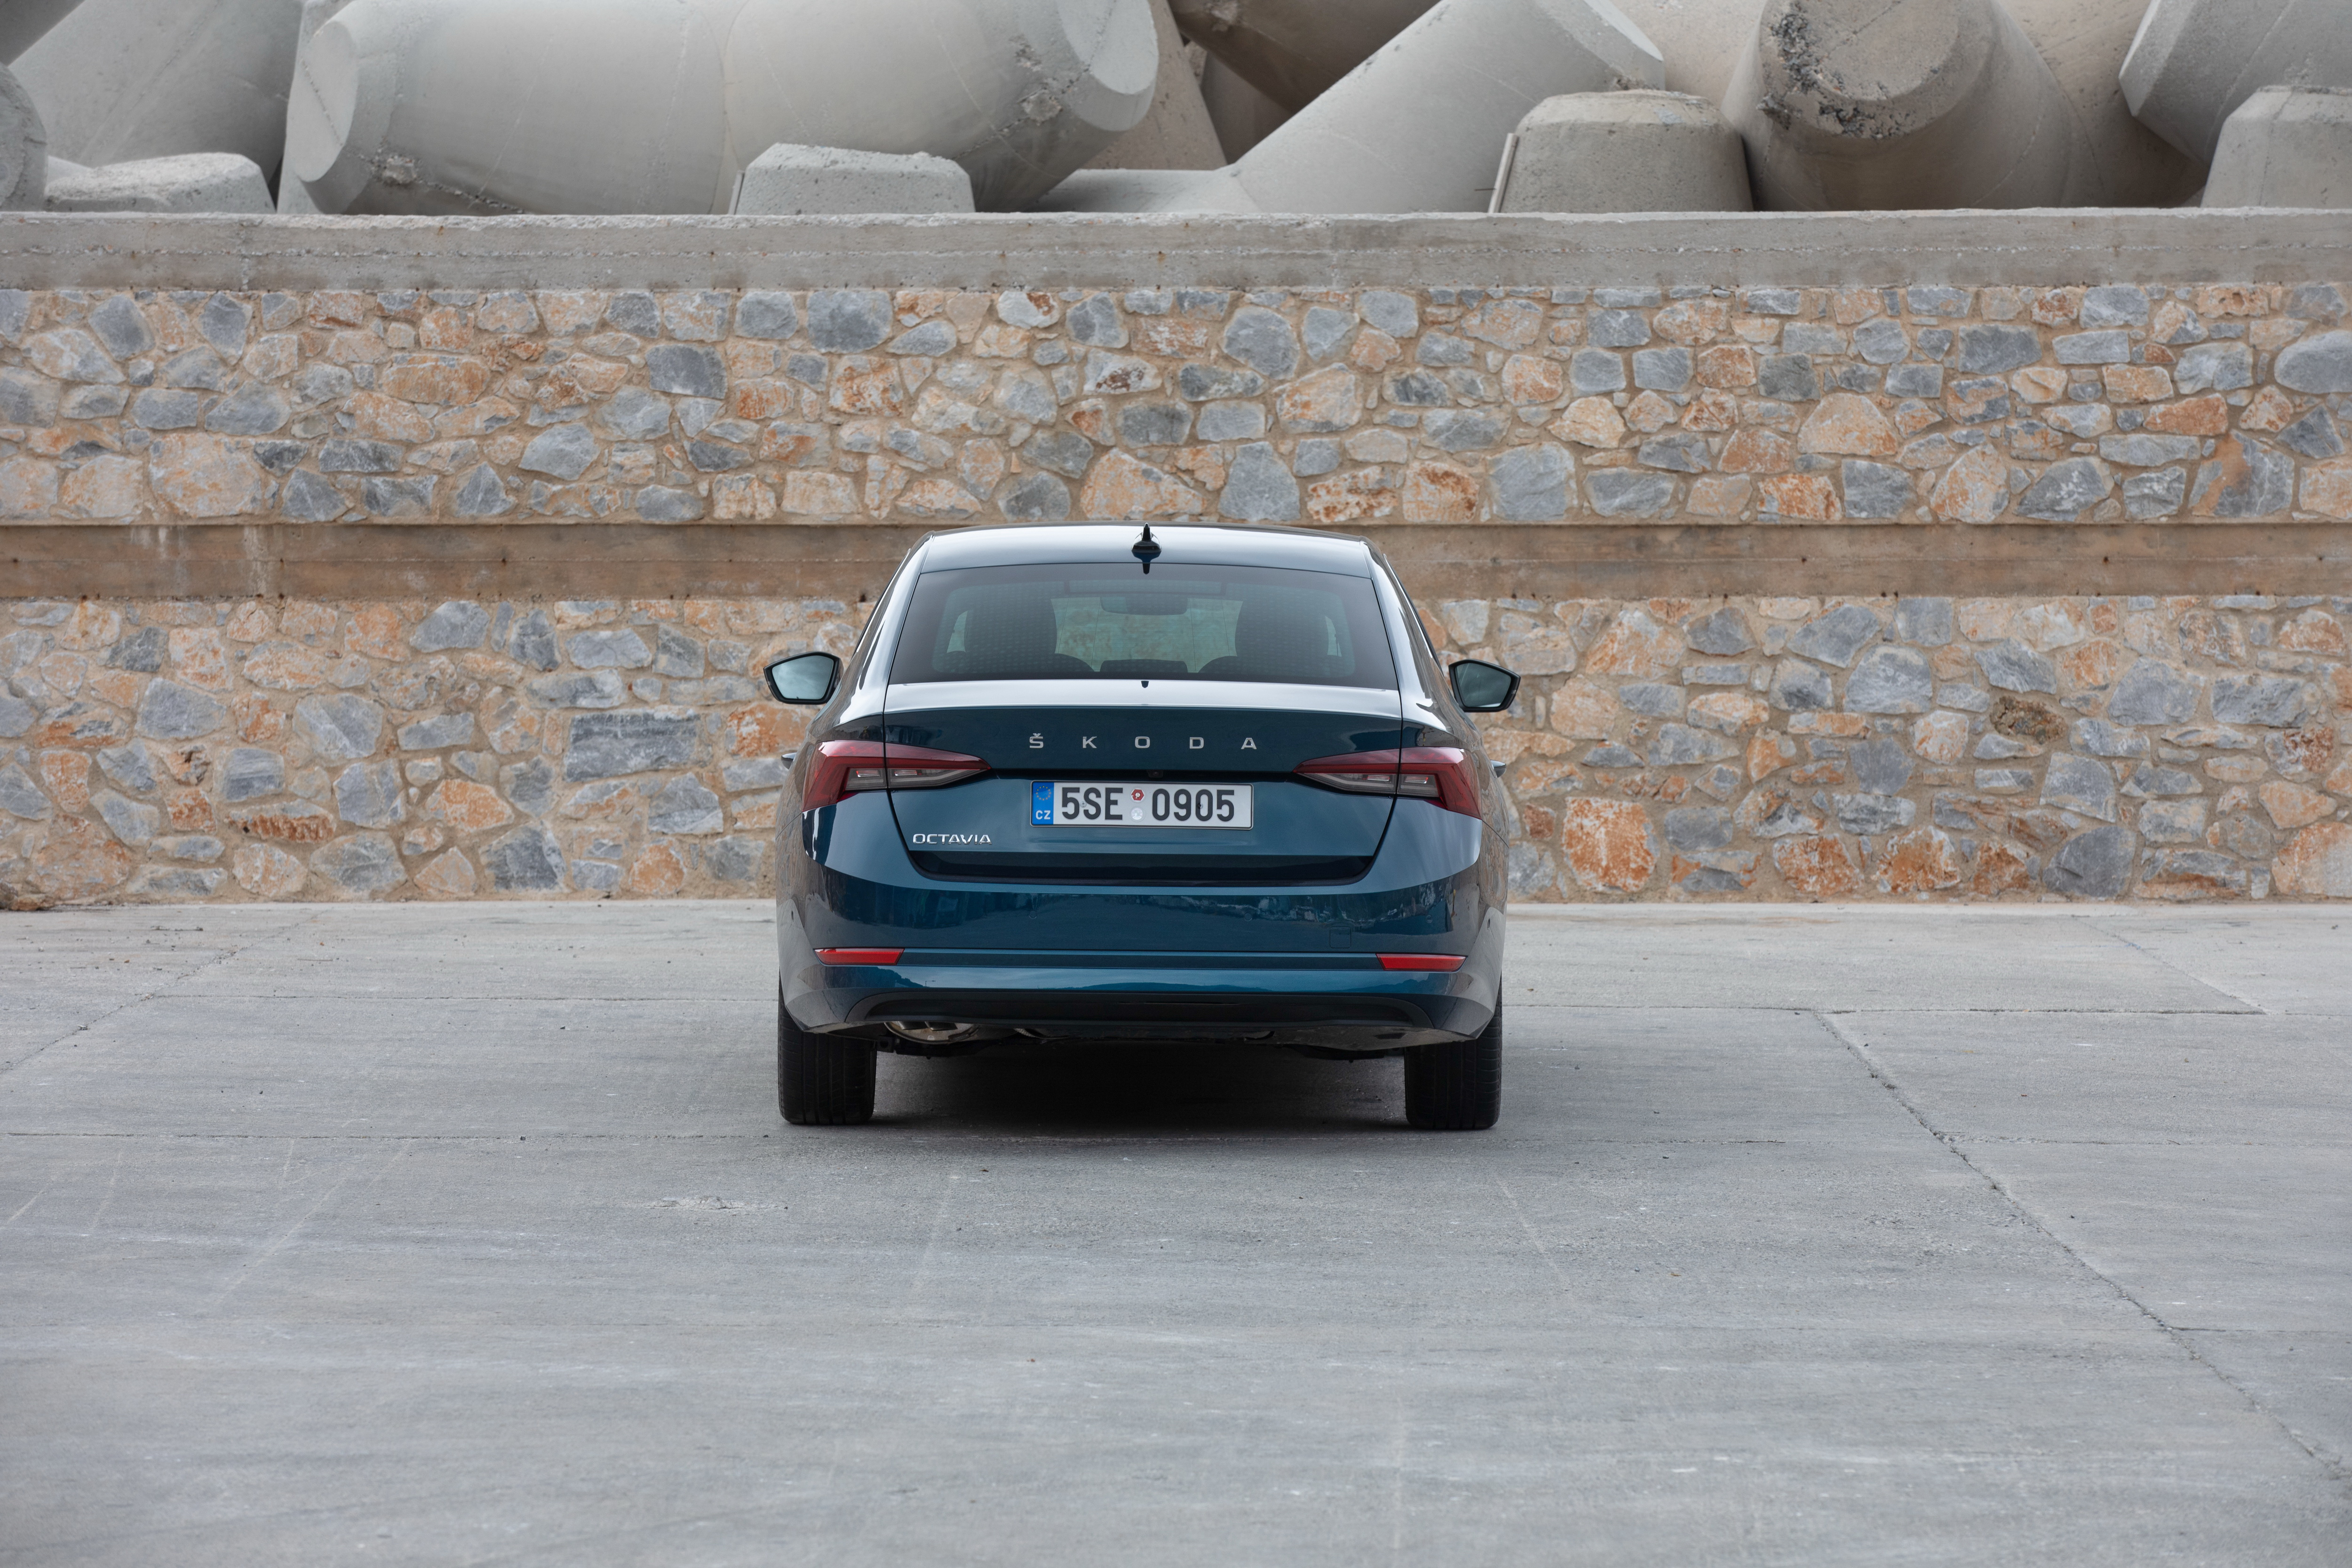 The all-new SKODA OCTAVIA: spacious, practical and elegant like a coupé - Image 5